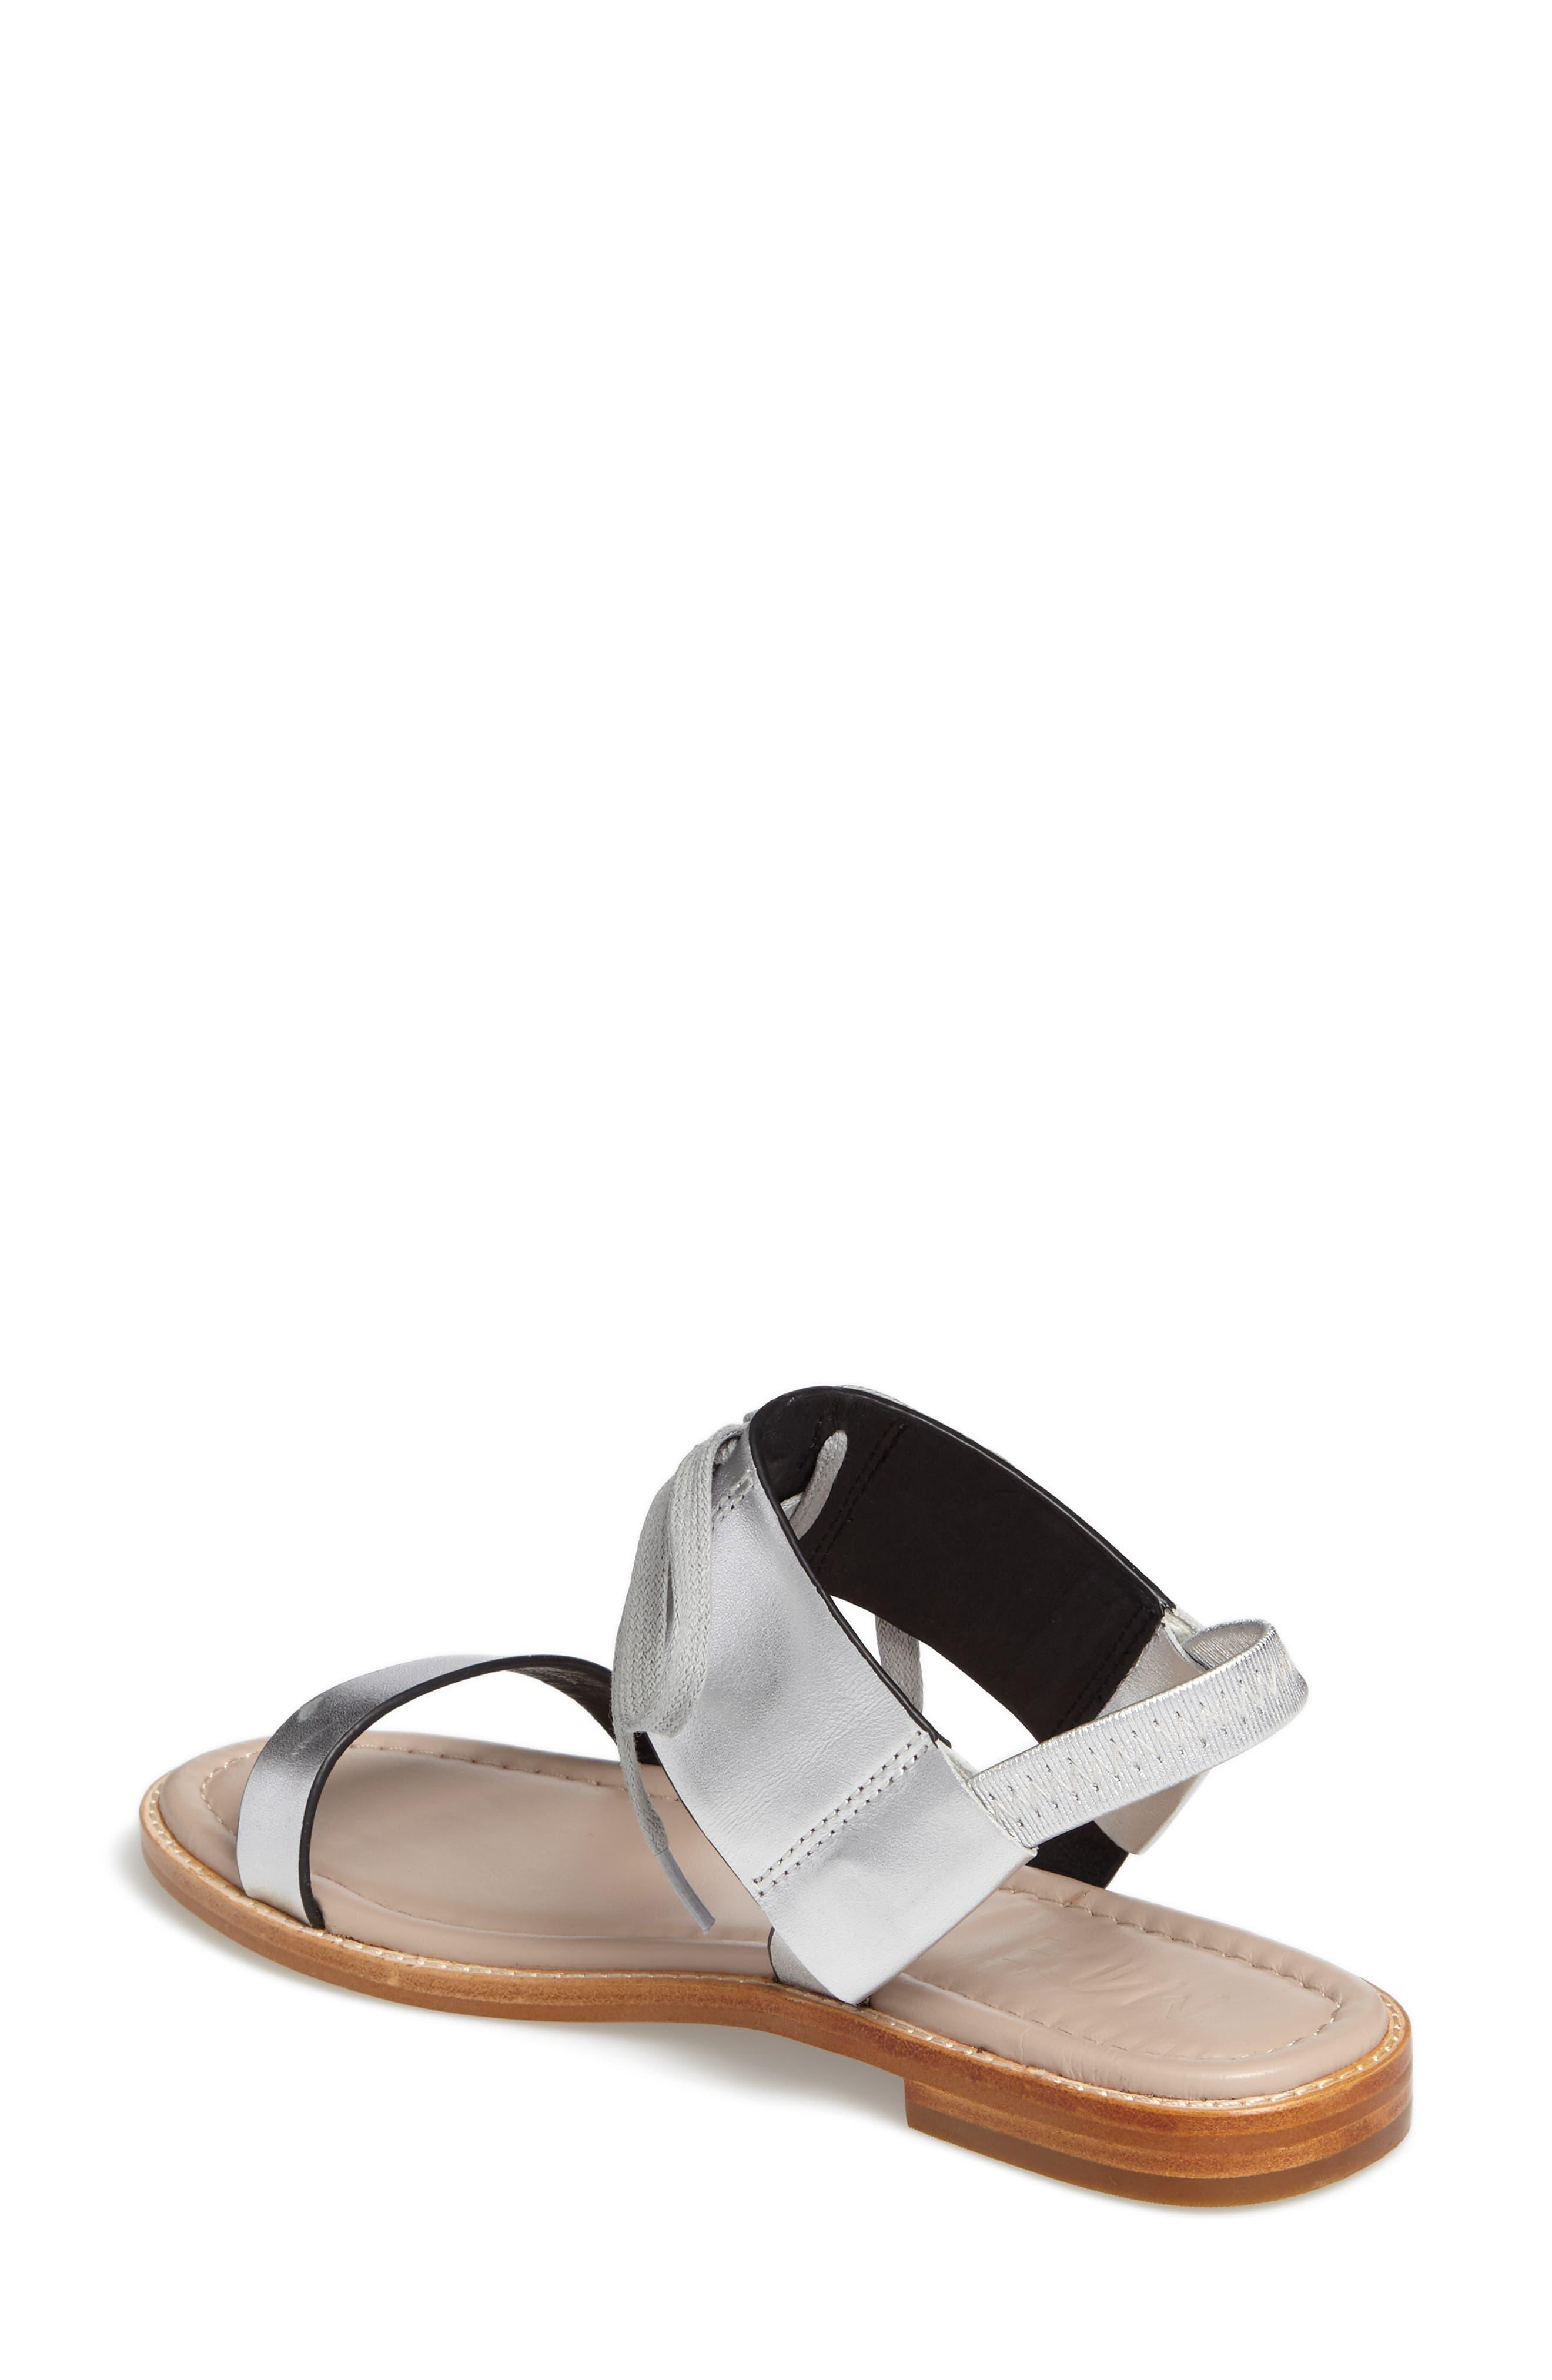 M4D3 Hailey Slingback Sandal,                             Alternate thumbnail 2, color,                             Silver Leather